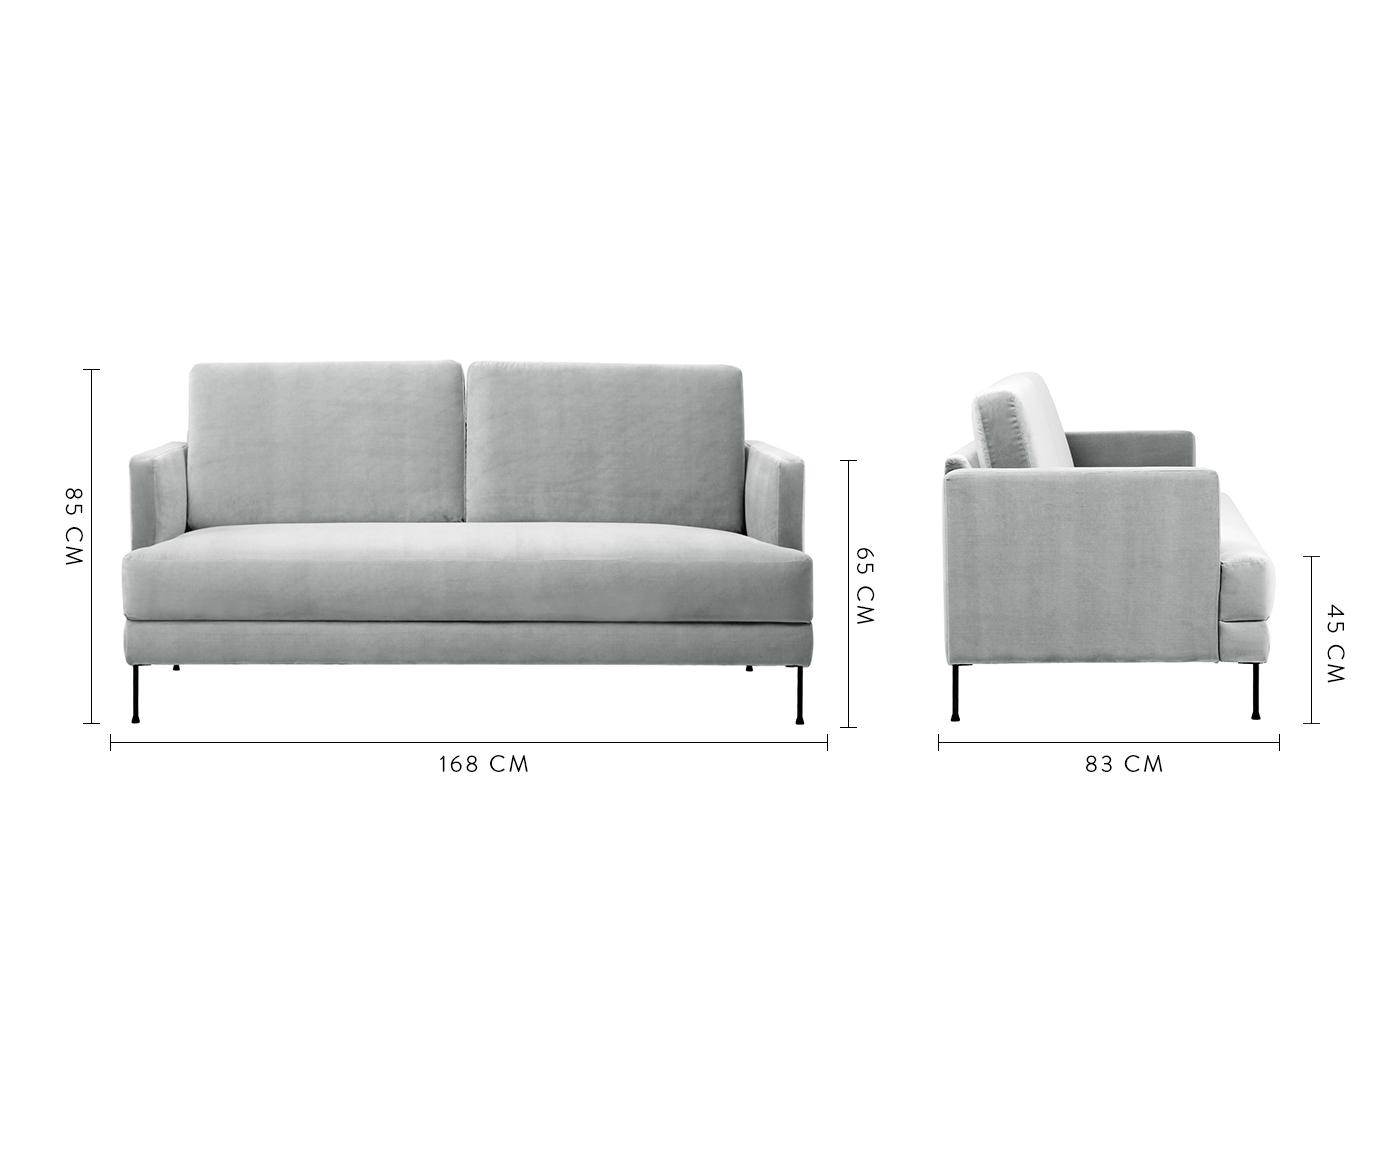 Samt-Sofa Fluente (2-Sitzer), Bezug: Samt (Hochwertiger Polyes, Gestell: Massives Kiefernholz, Füße: Metall, lackiert, Samt Hellgrau, B 168 x T 83 cm